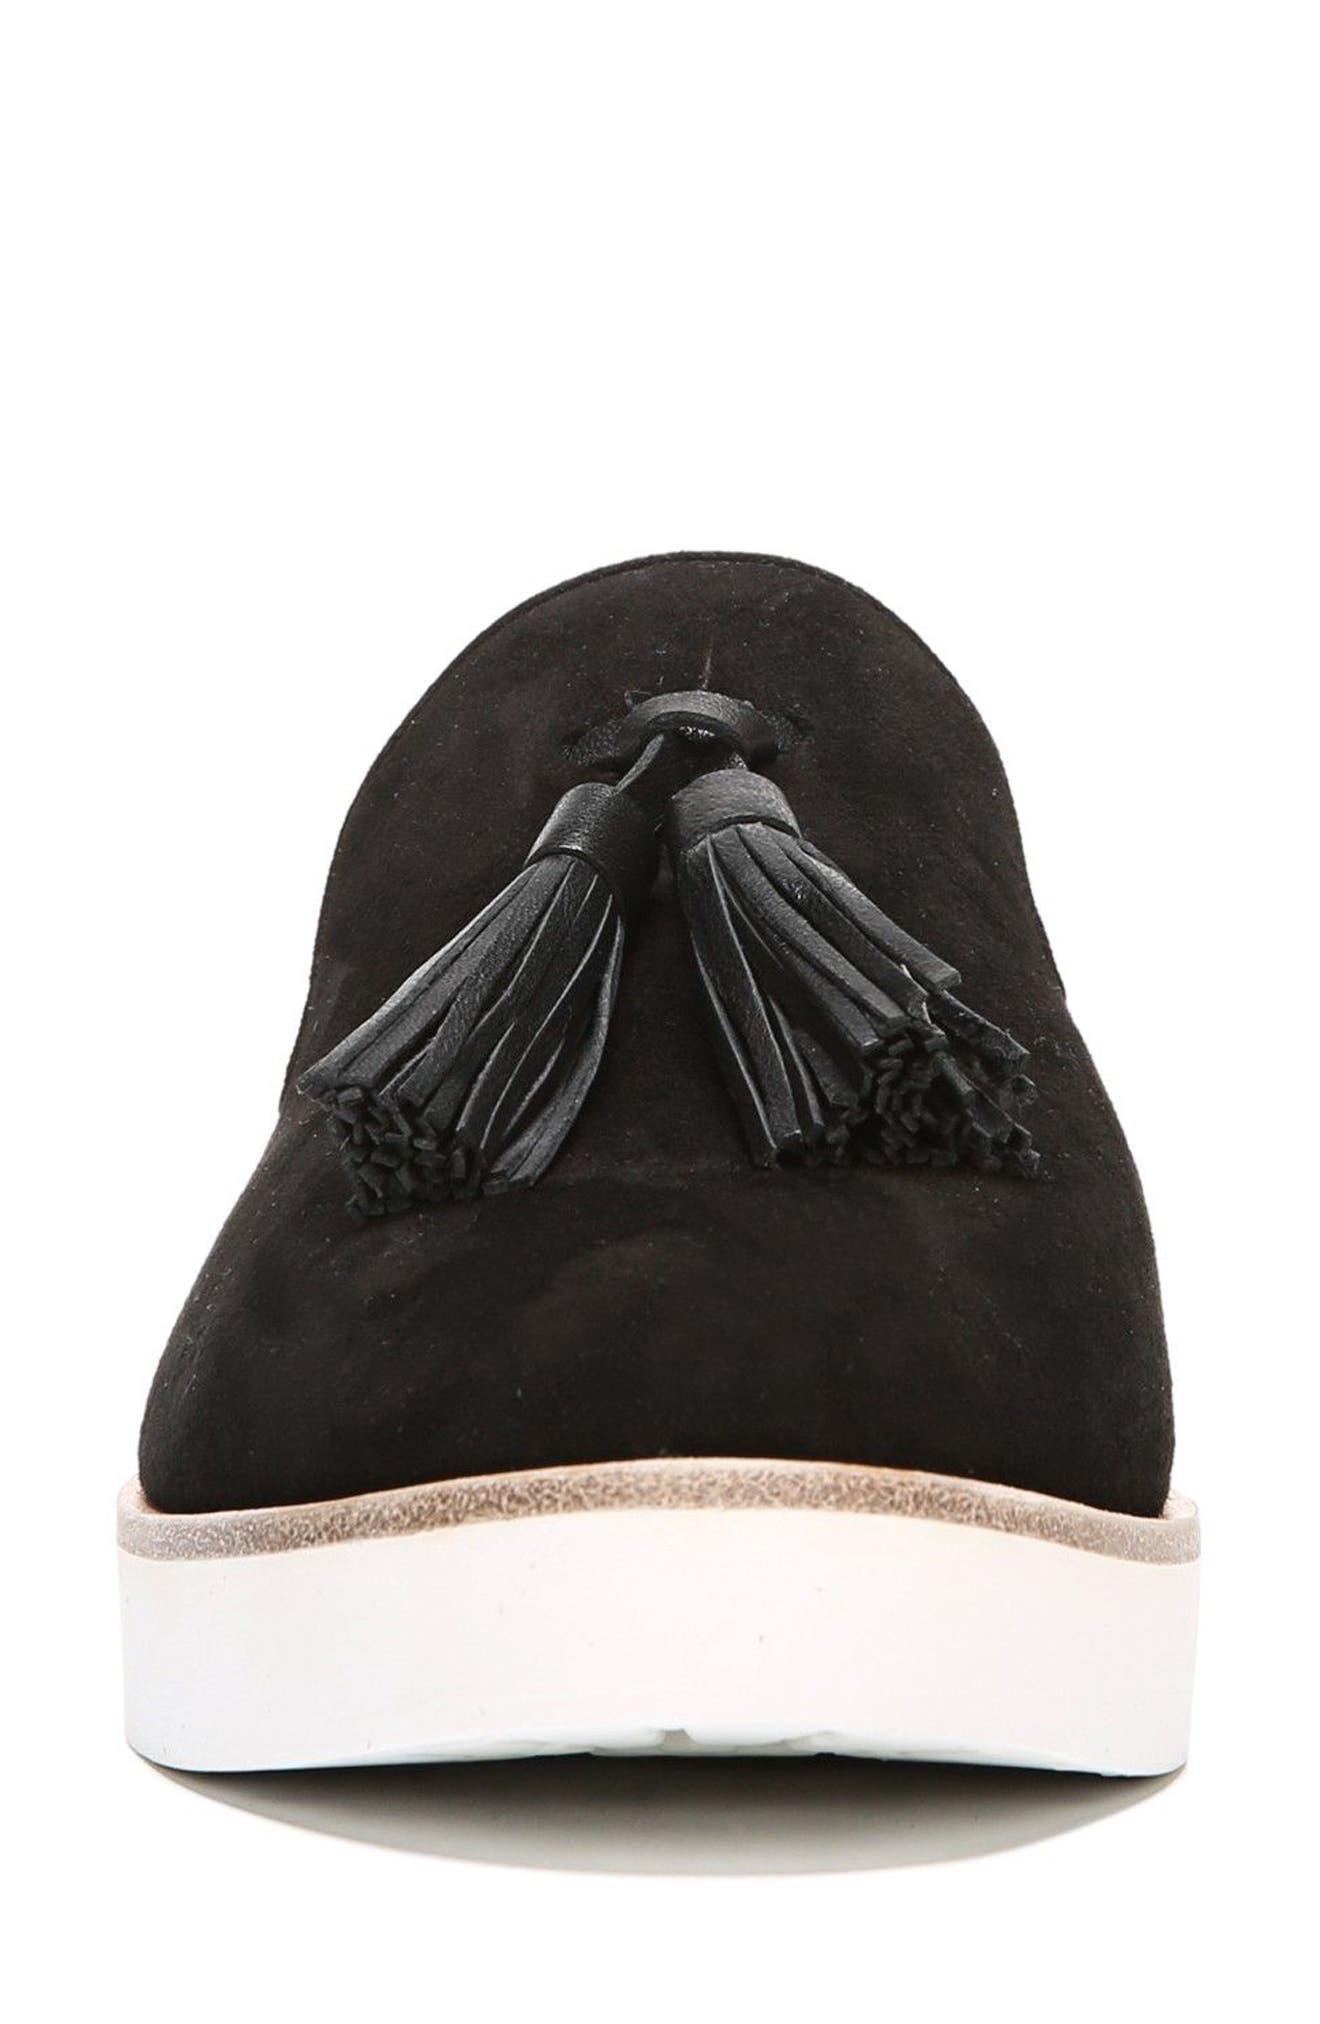 Toni Slip-On Sneaker,                             Alternate thumbnail 4, color,                             Black Suede